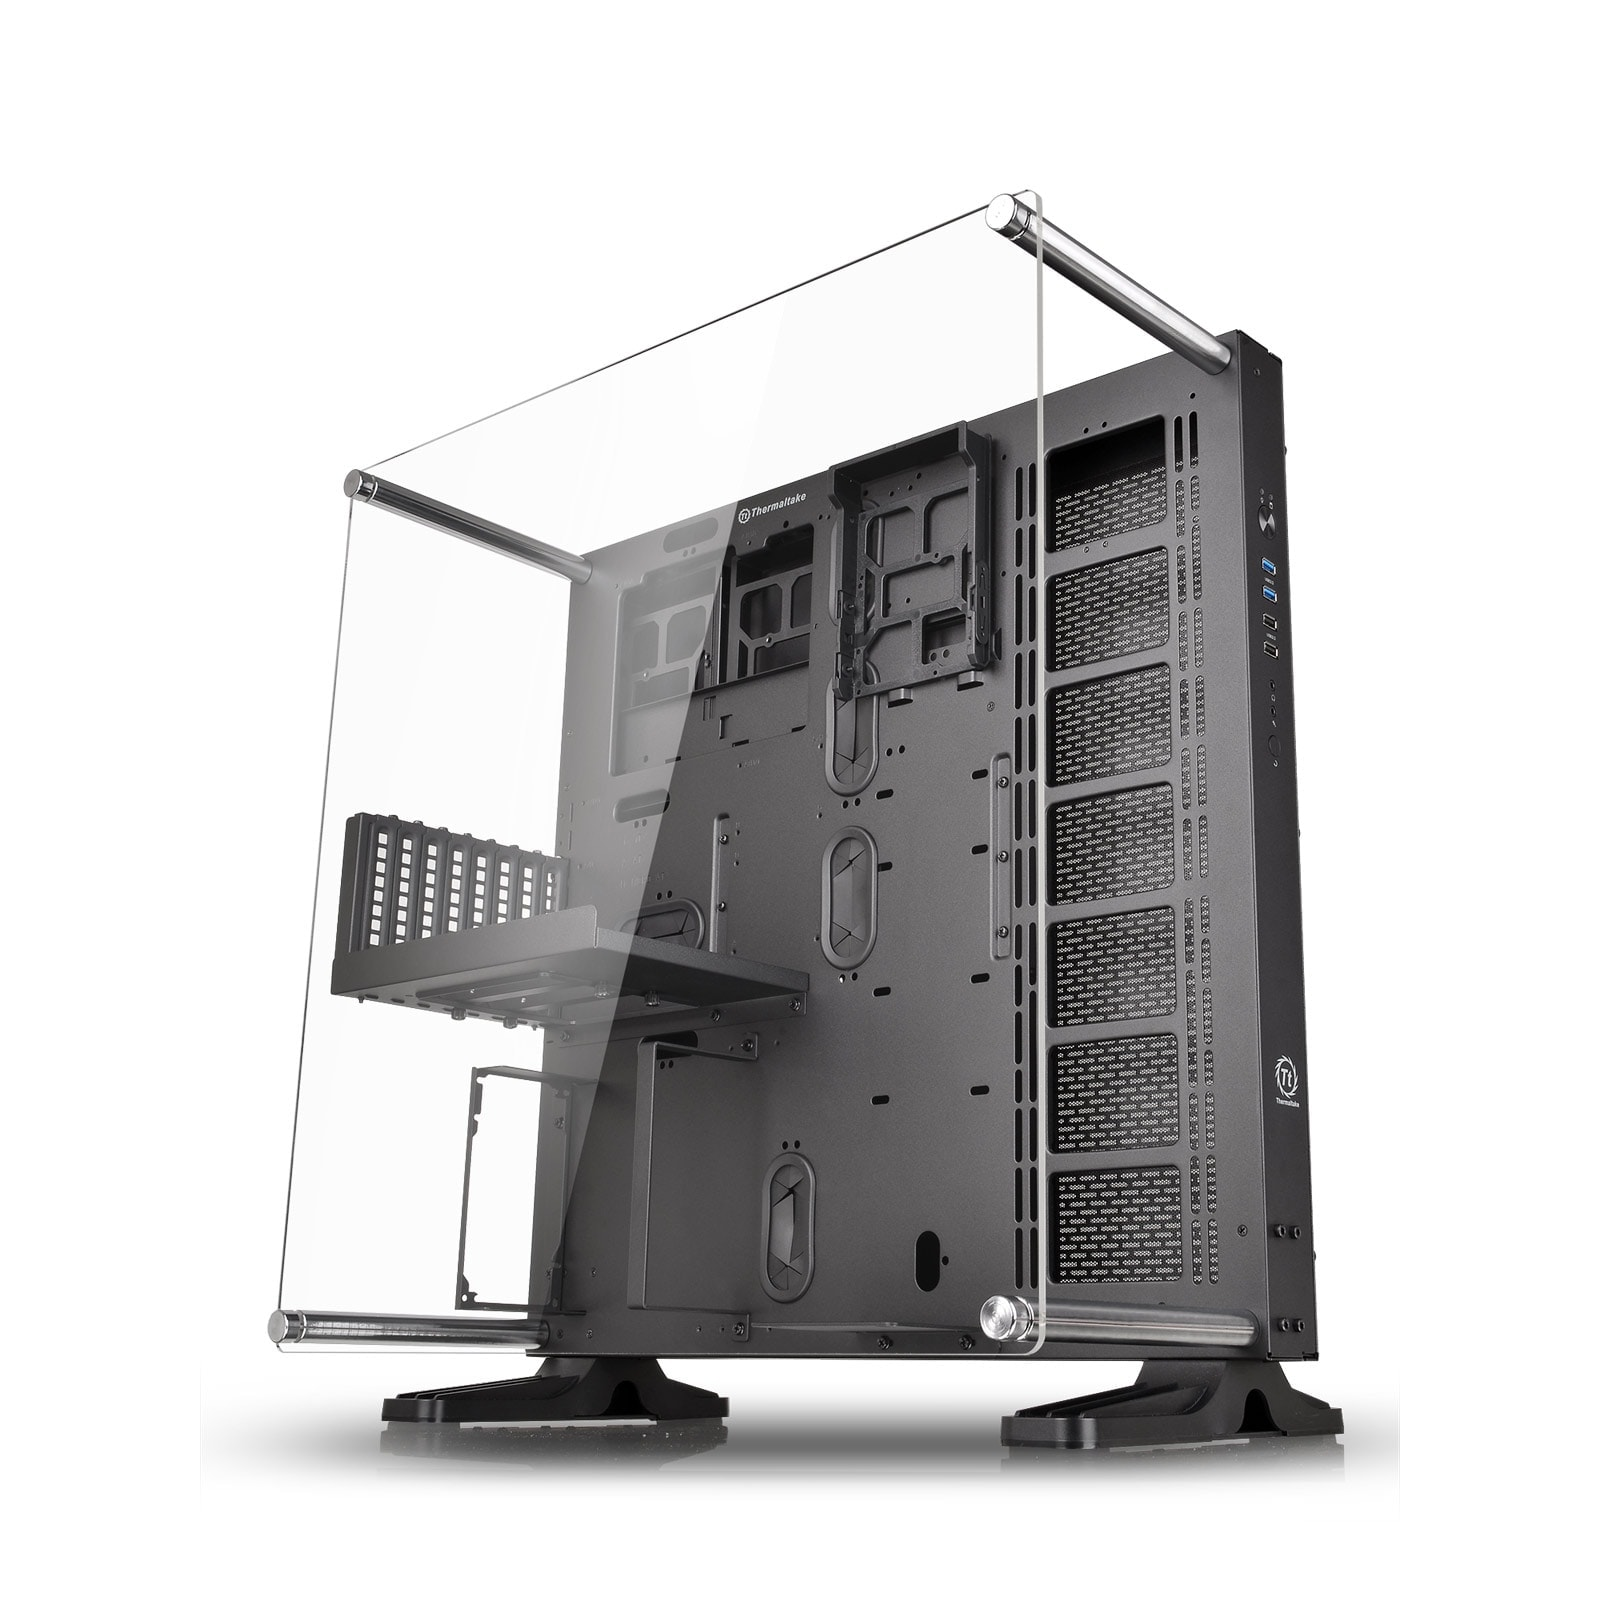 Thermaltake Core P5 (CA-1E7-00M1WN-00) - Achat / Vente Boîtier PC sur Cybertek.fr - 0